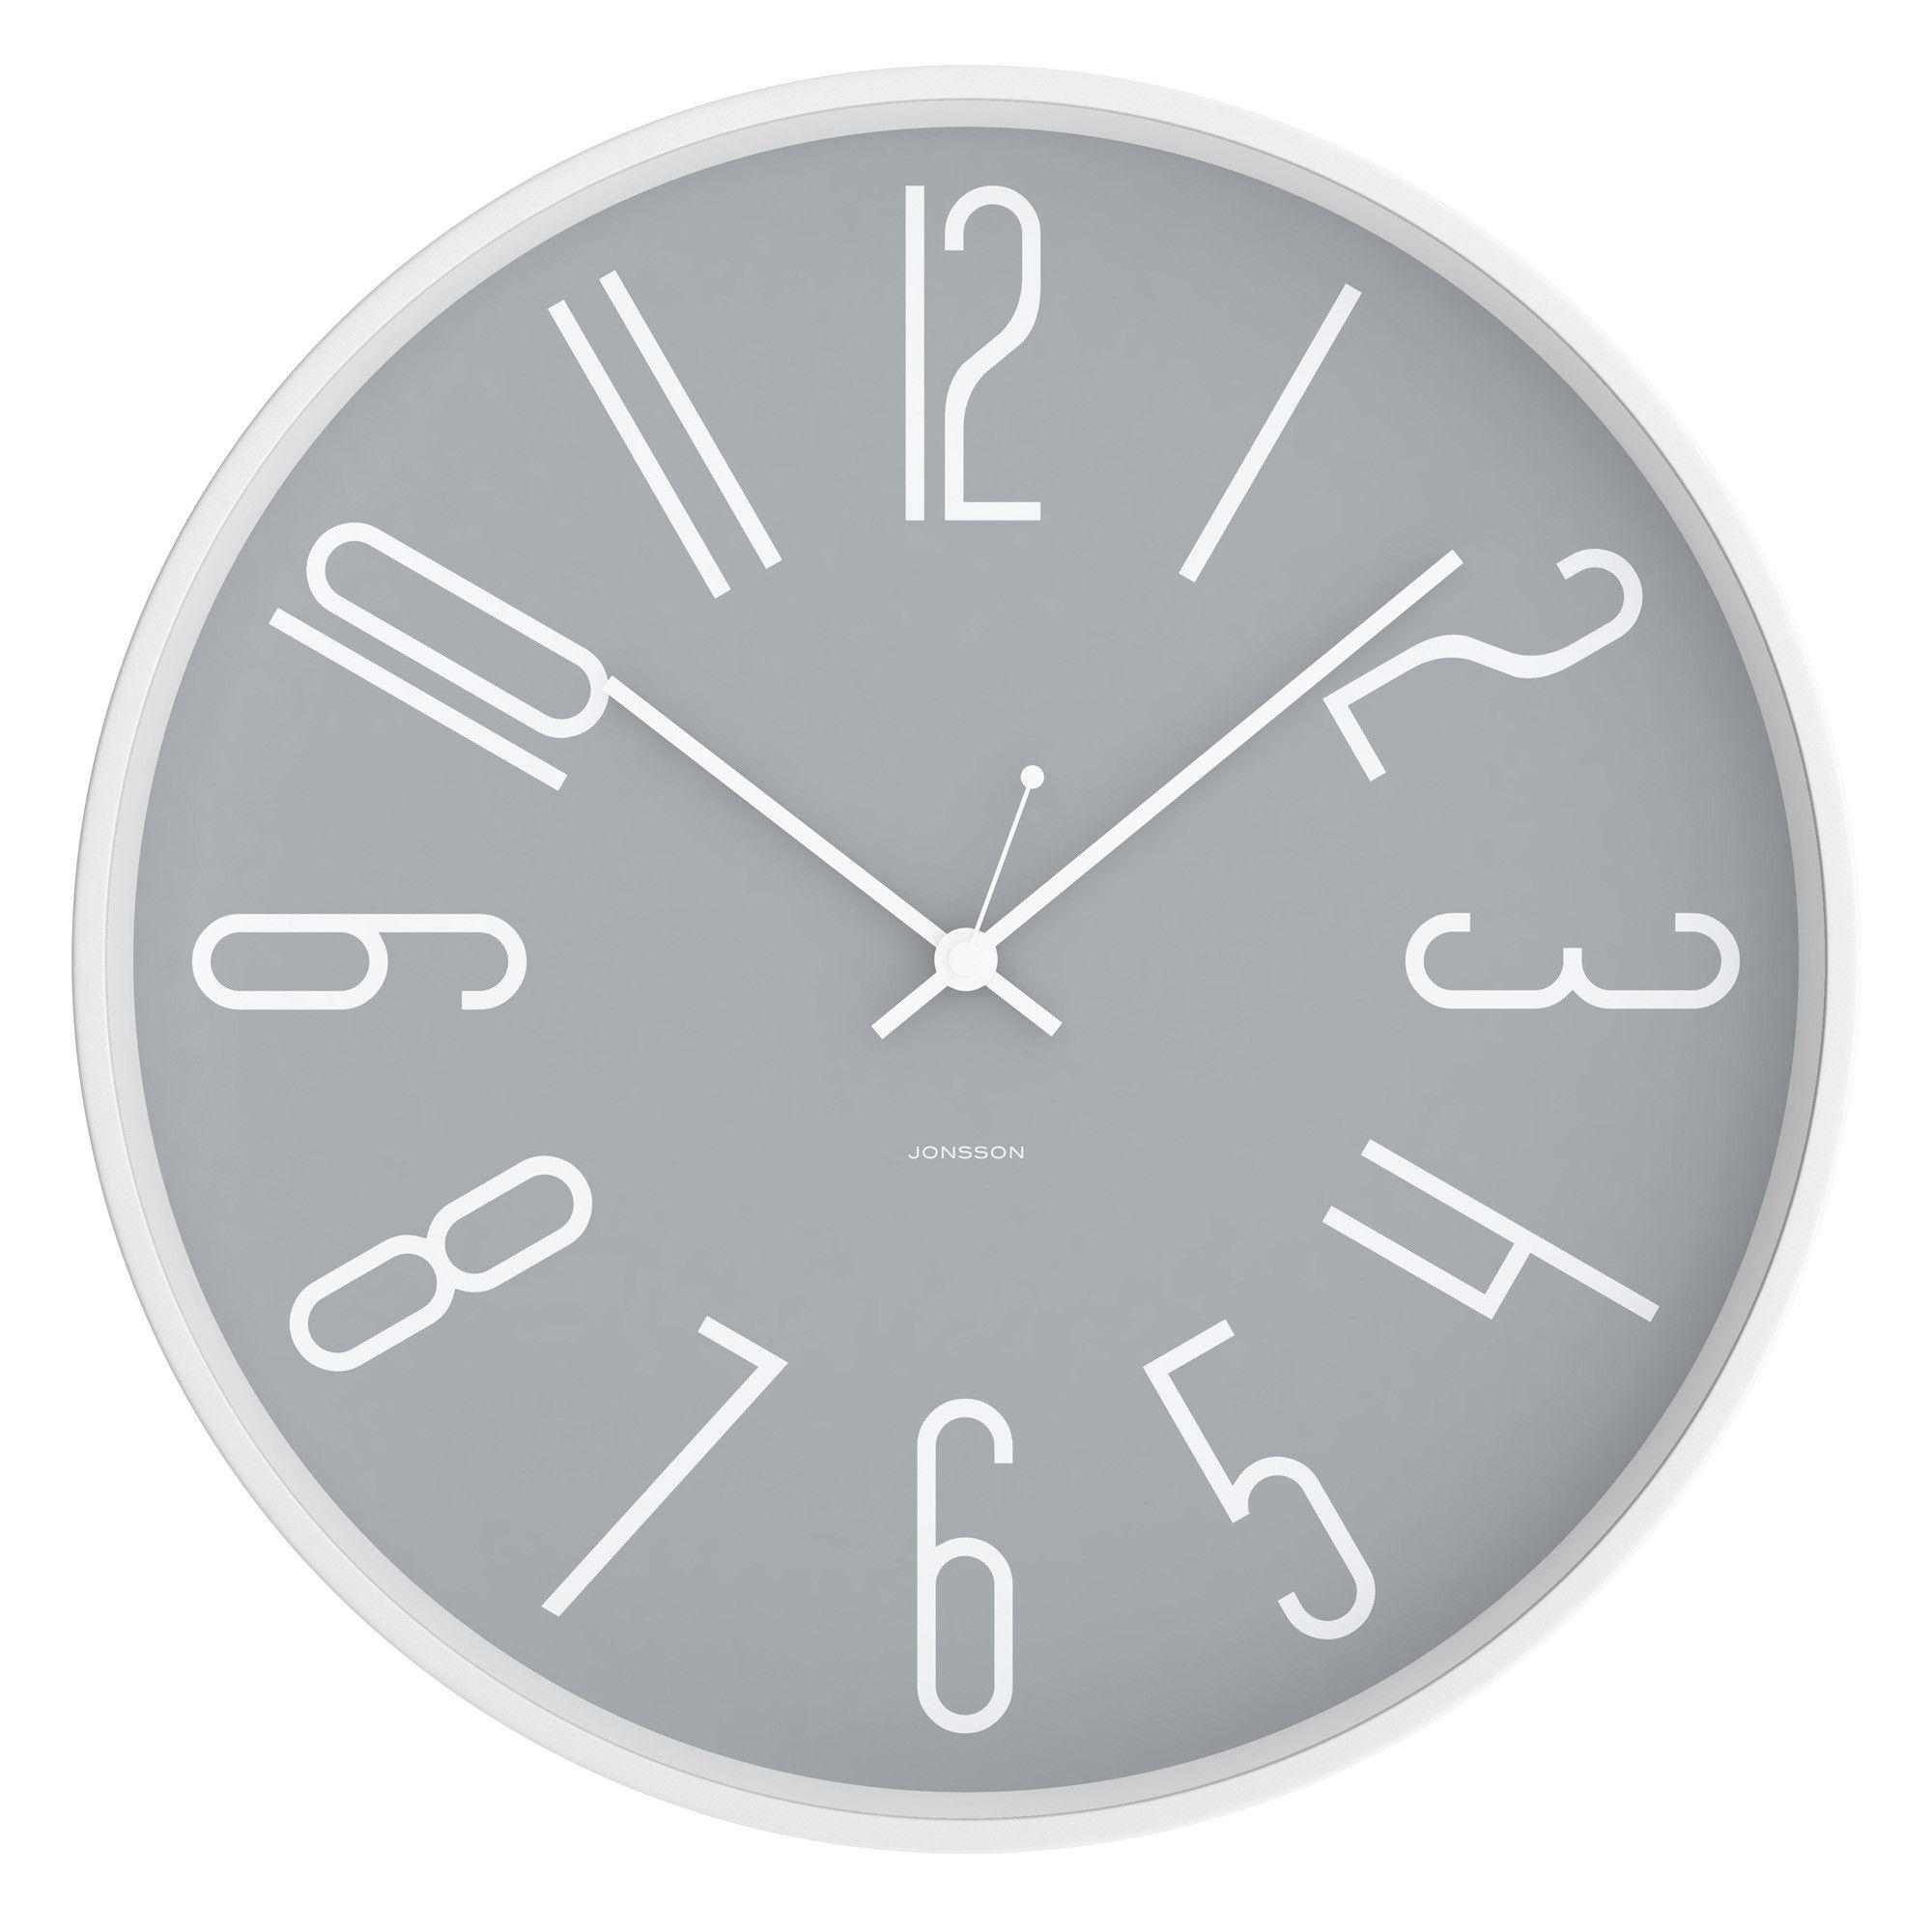 87 12 Wall Clock Nesting Pinterest Wall Clocks Clocks